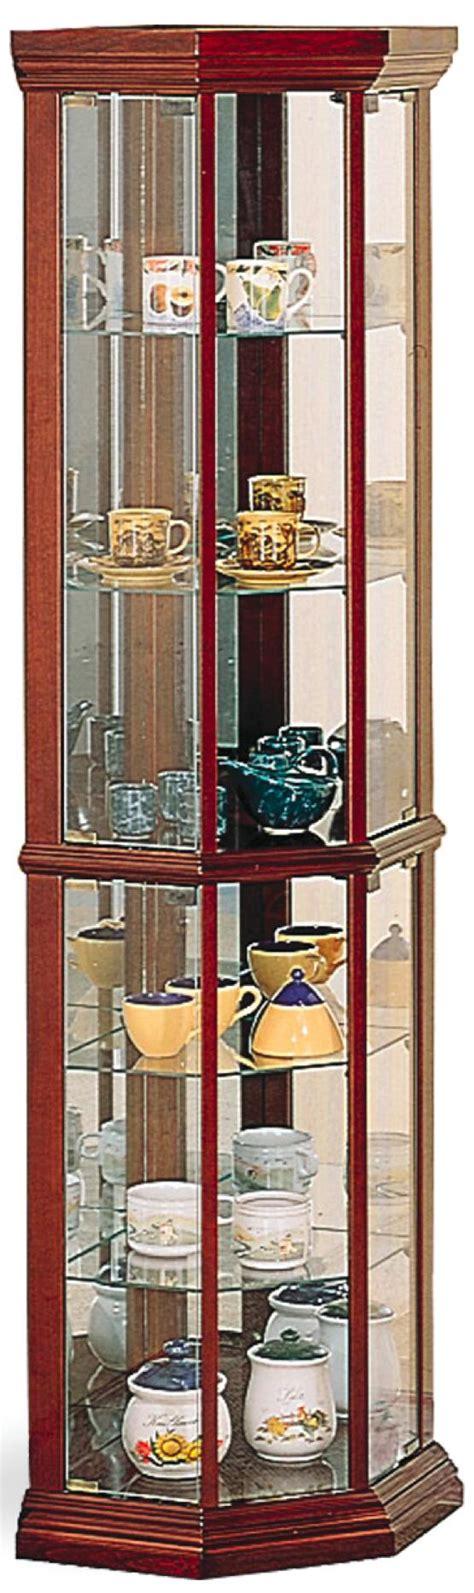 cherry wood curio coaster curio cabinets 3393 solid wood cherry glass corner